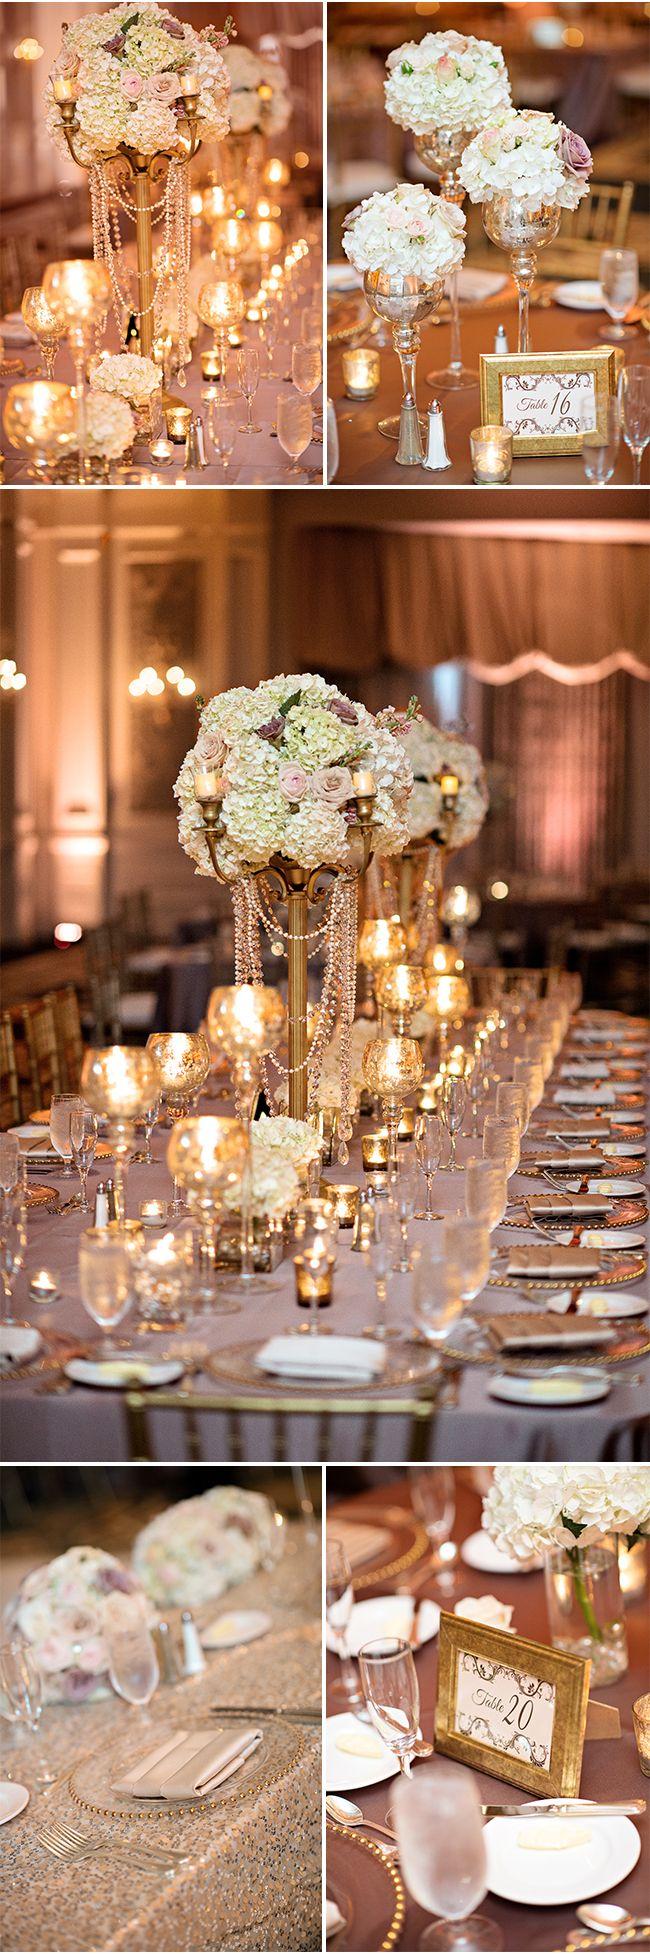 Tablescape Google Search Wedding Decor Elegant Wedding Reception Decorations Wedding Reception Tablescapes